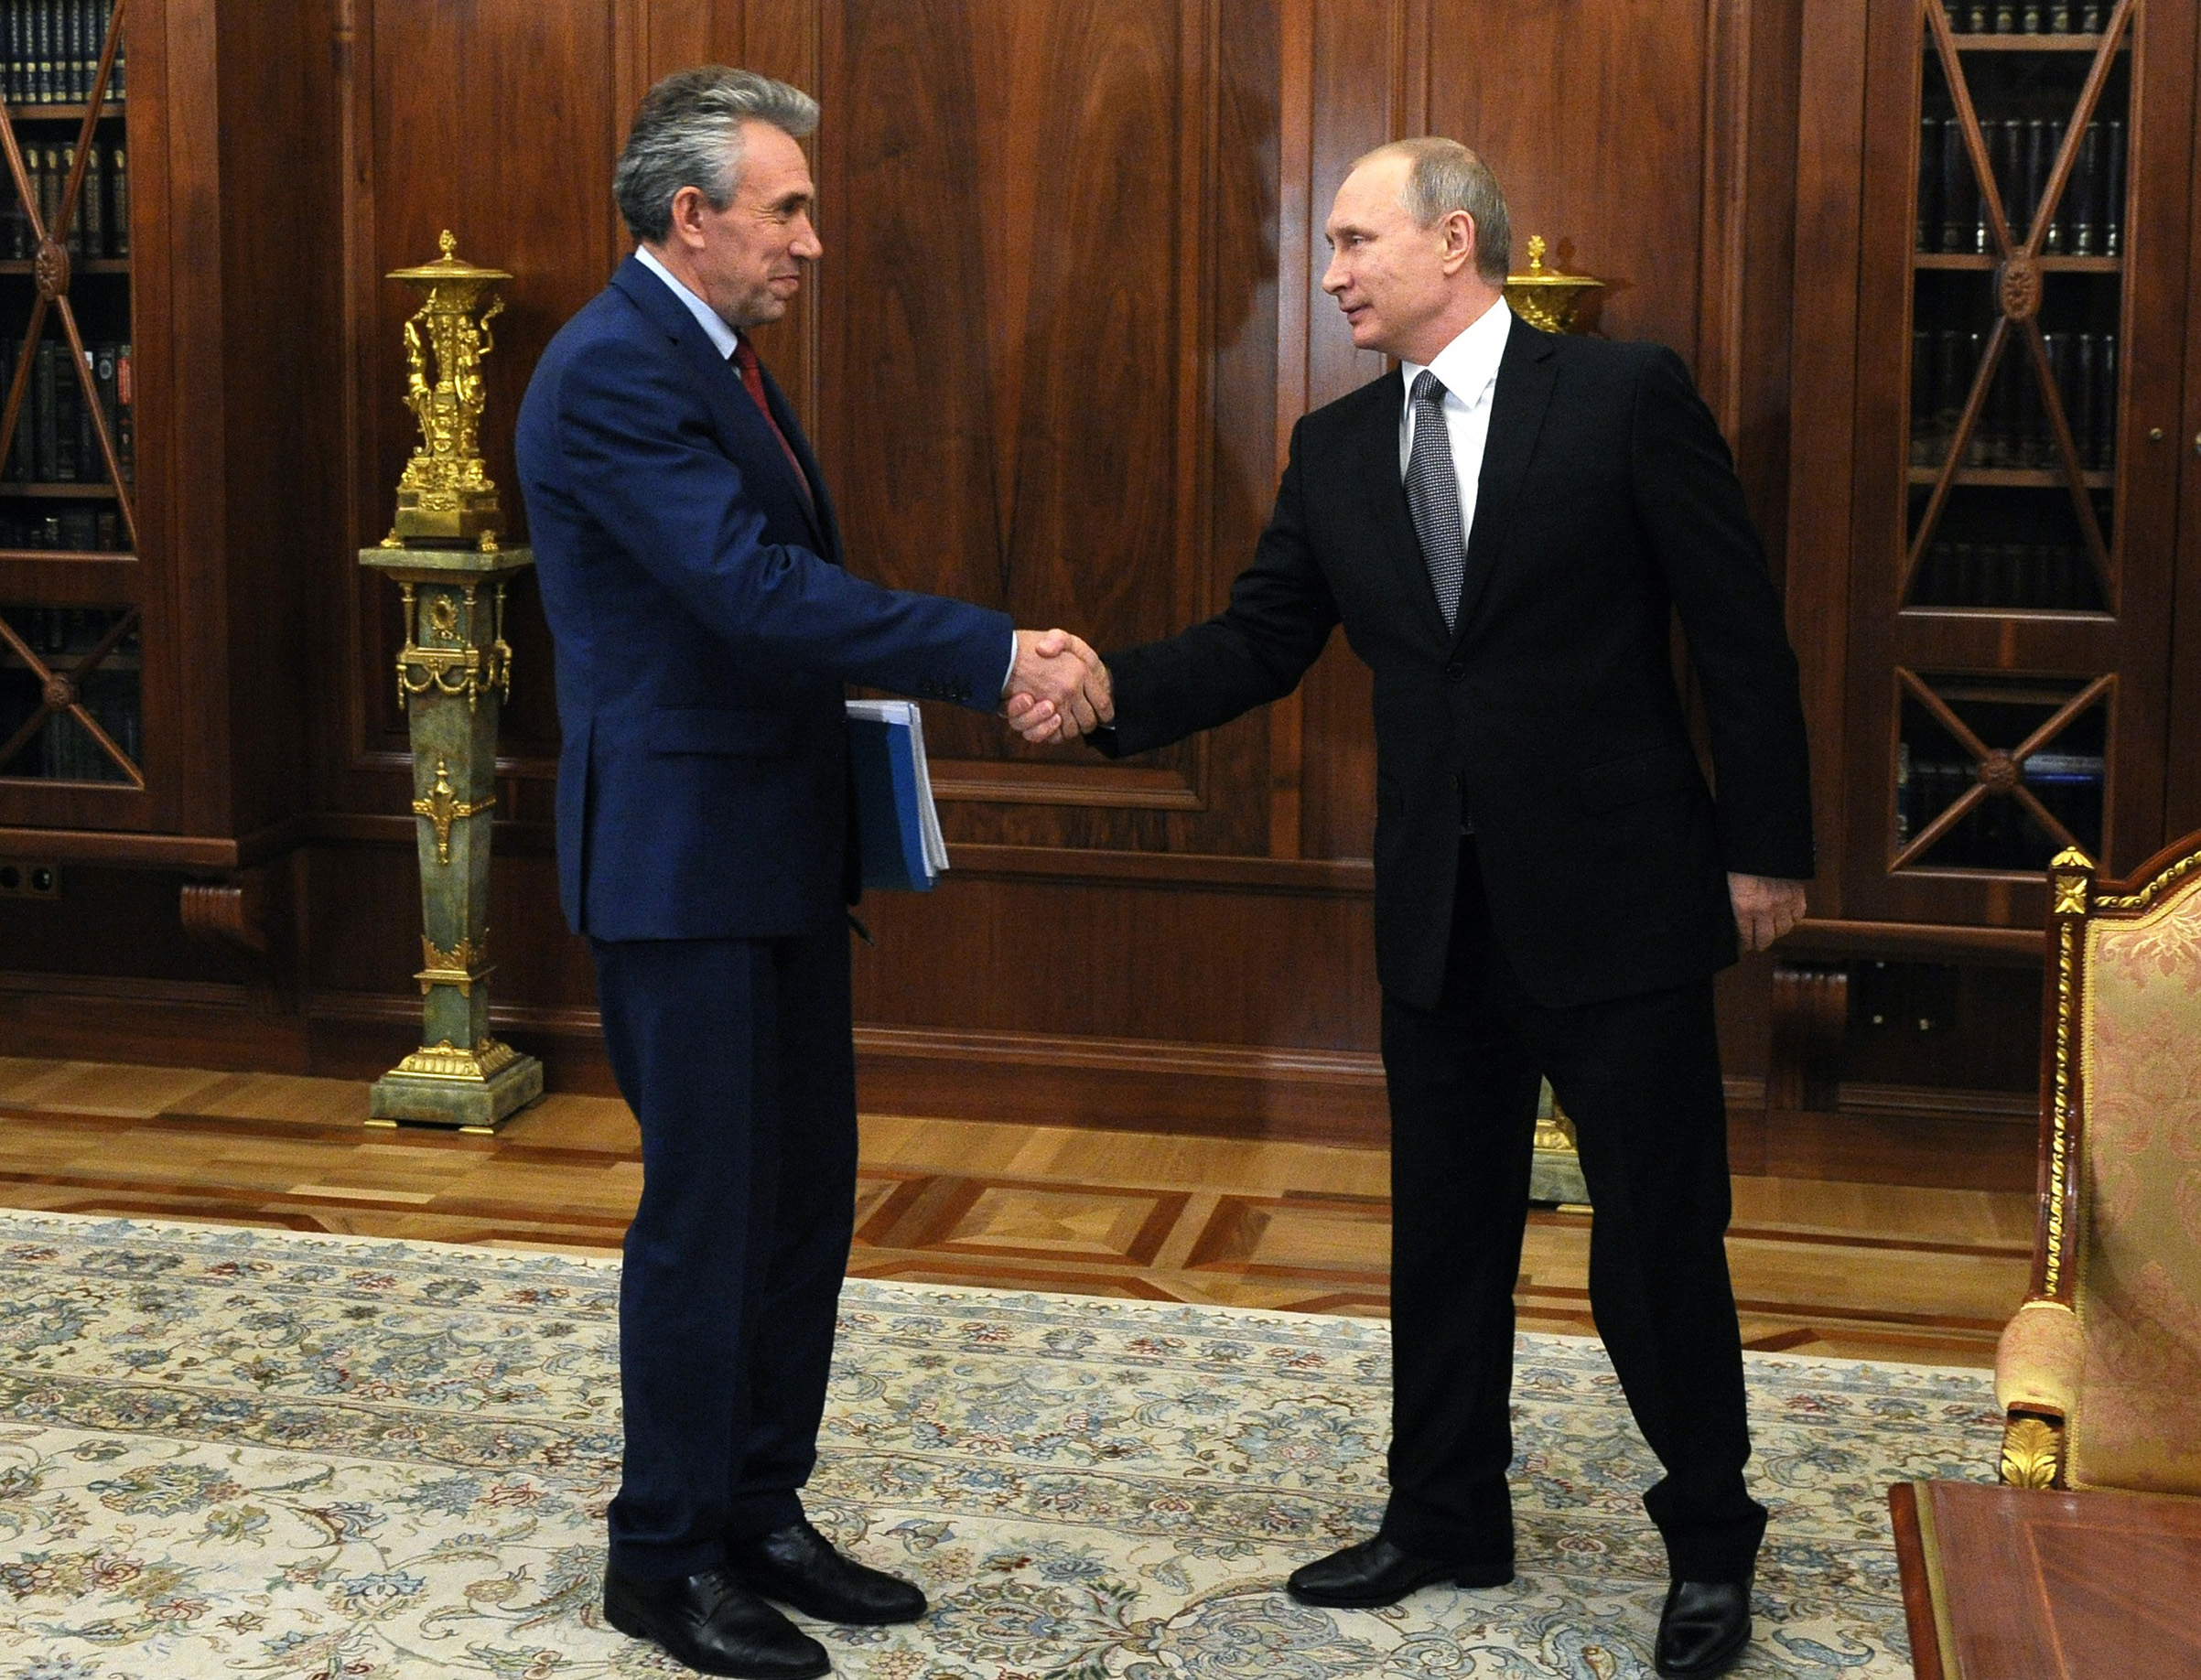 Then-Chairman of Russia's Vnesheconombank, Sergey Gorkov, left, meets Russian President Vladimir Putin at the Kremlin on Aug. 3, 2016.